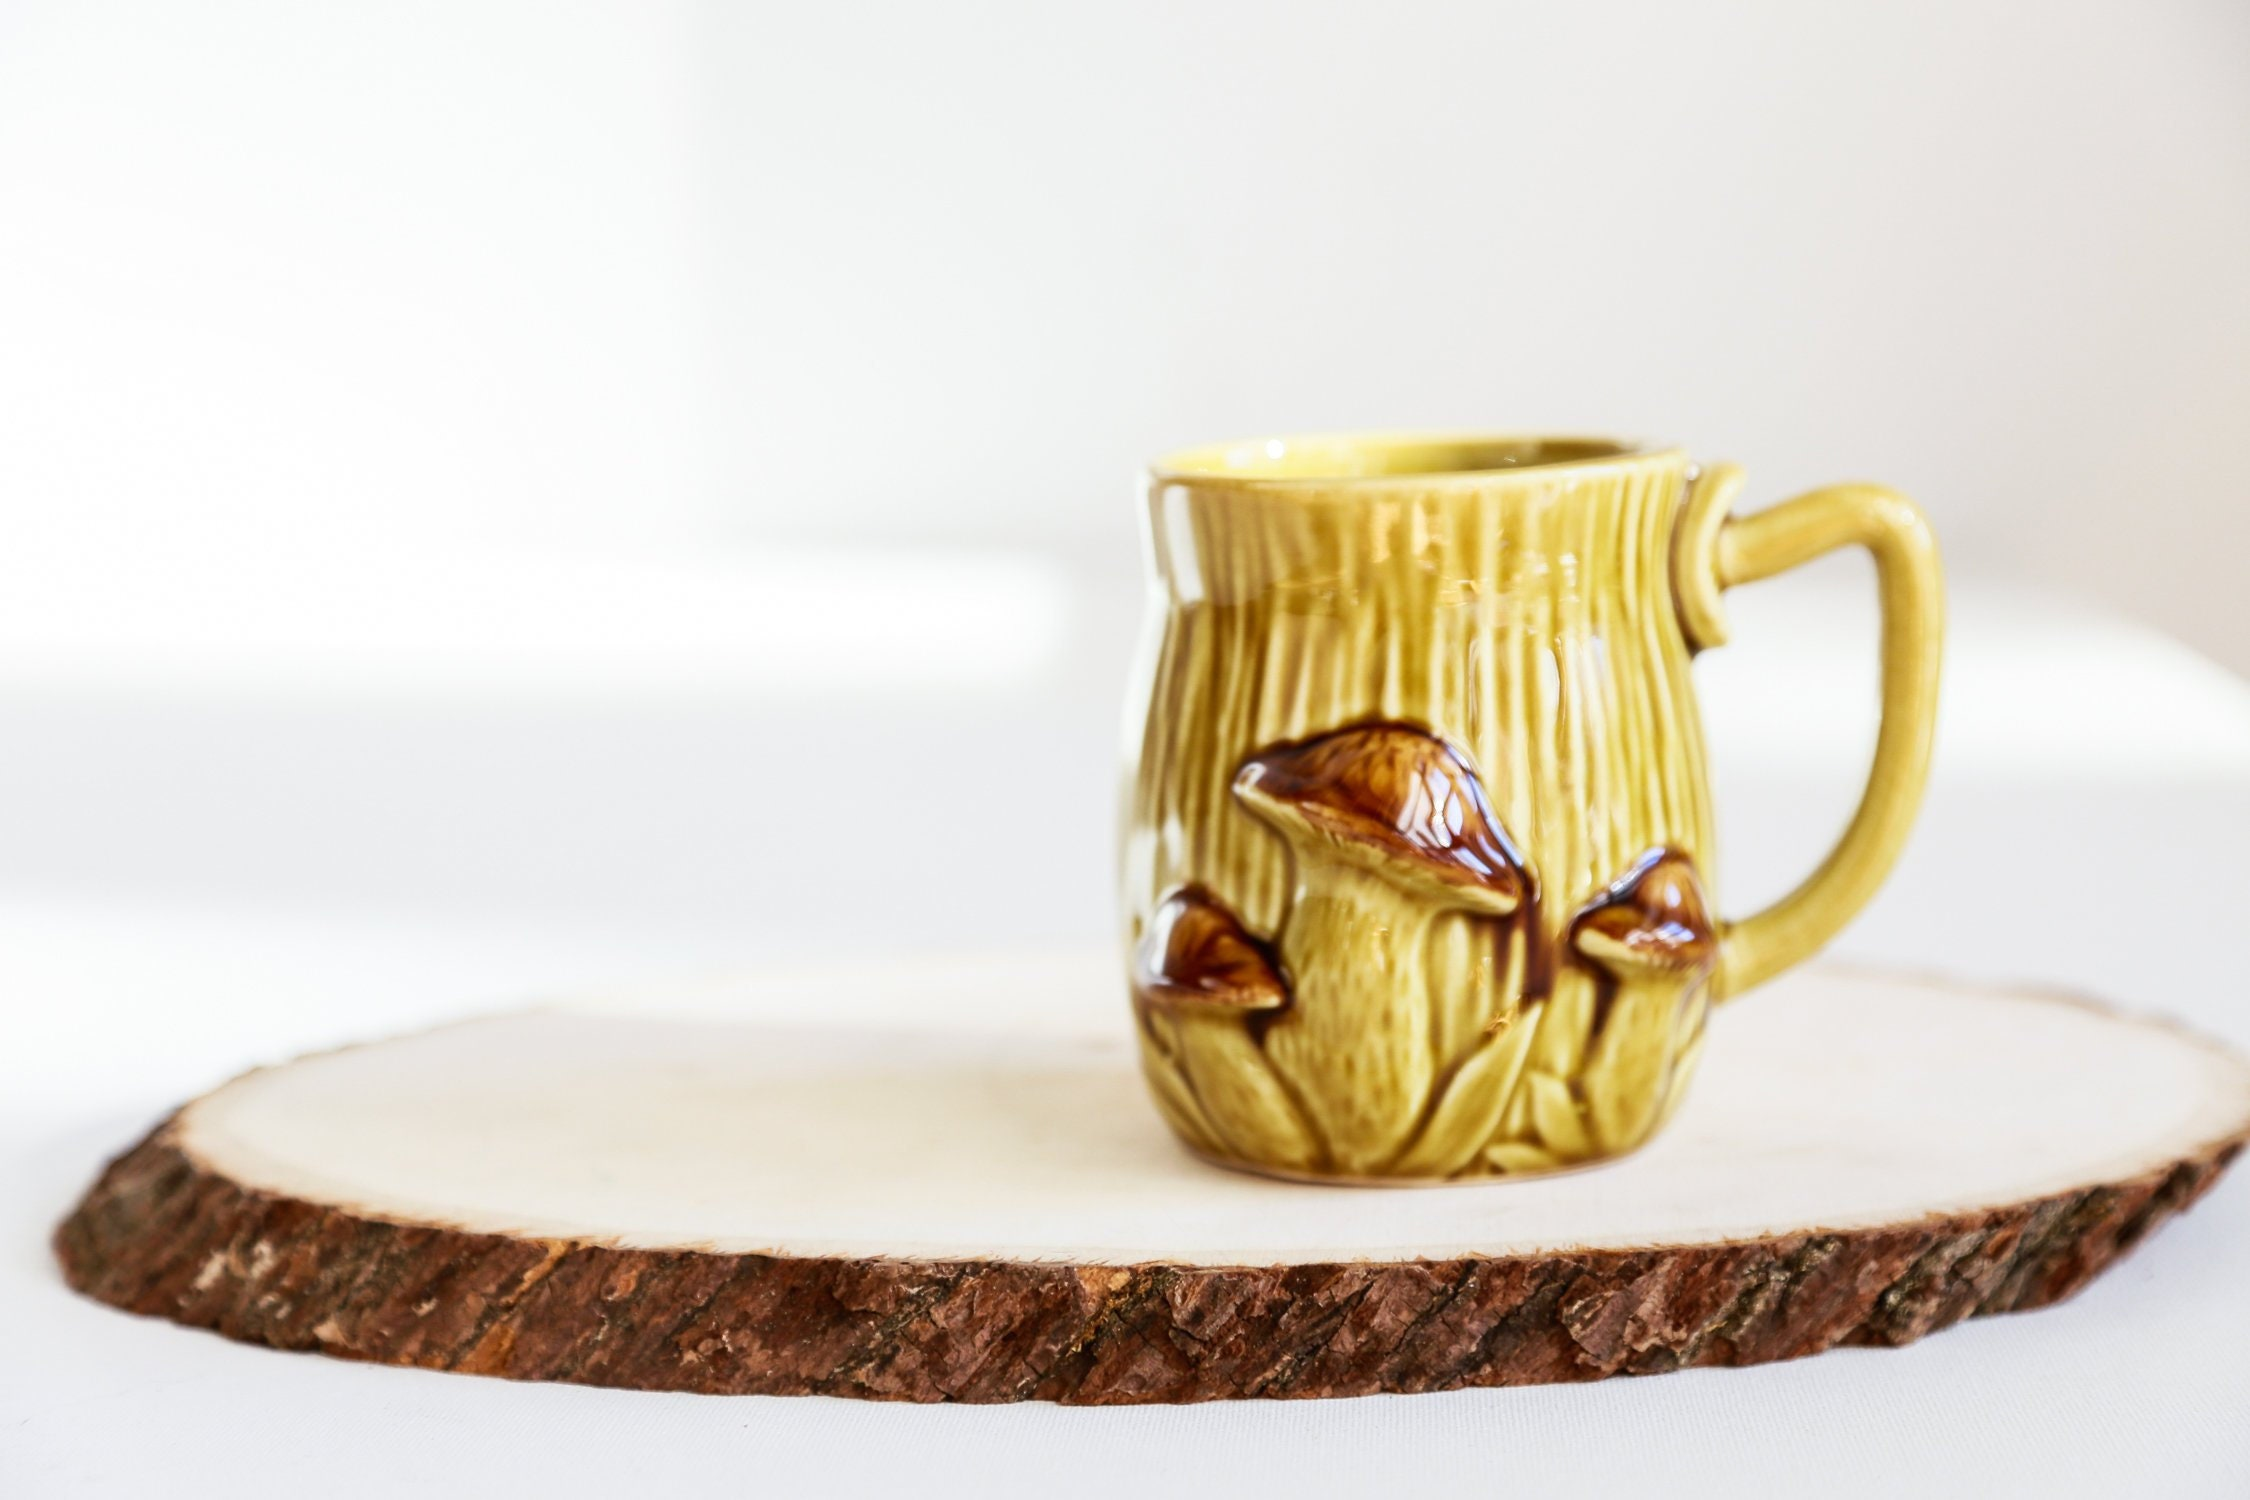 70s 3d Mushroom Theme Coffee Mug 70s Table Decor Hippie Mug Forest Theme Table Decor Farmhouse Kitchen Hand Painted Coffee Mug